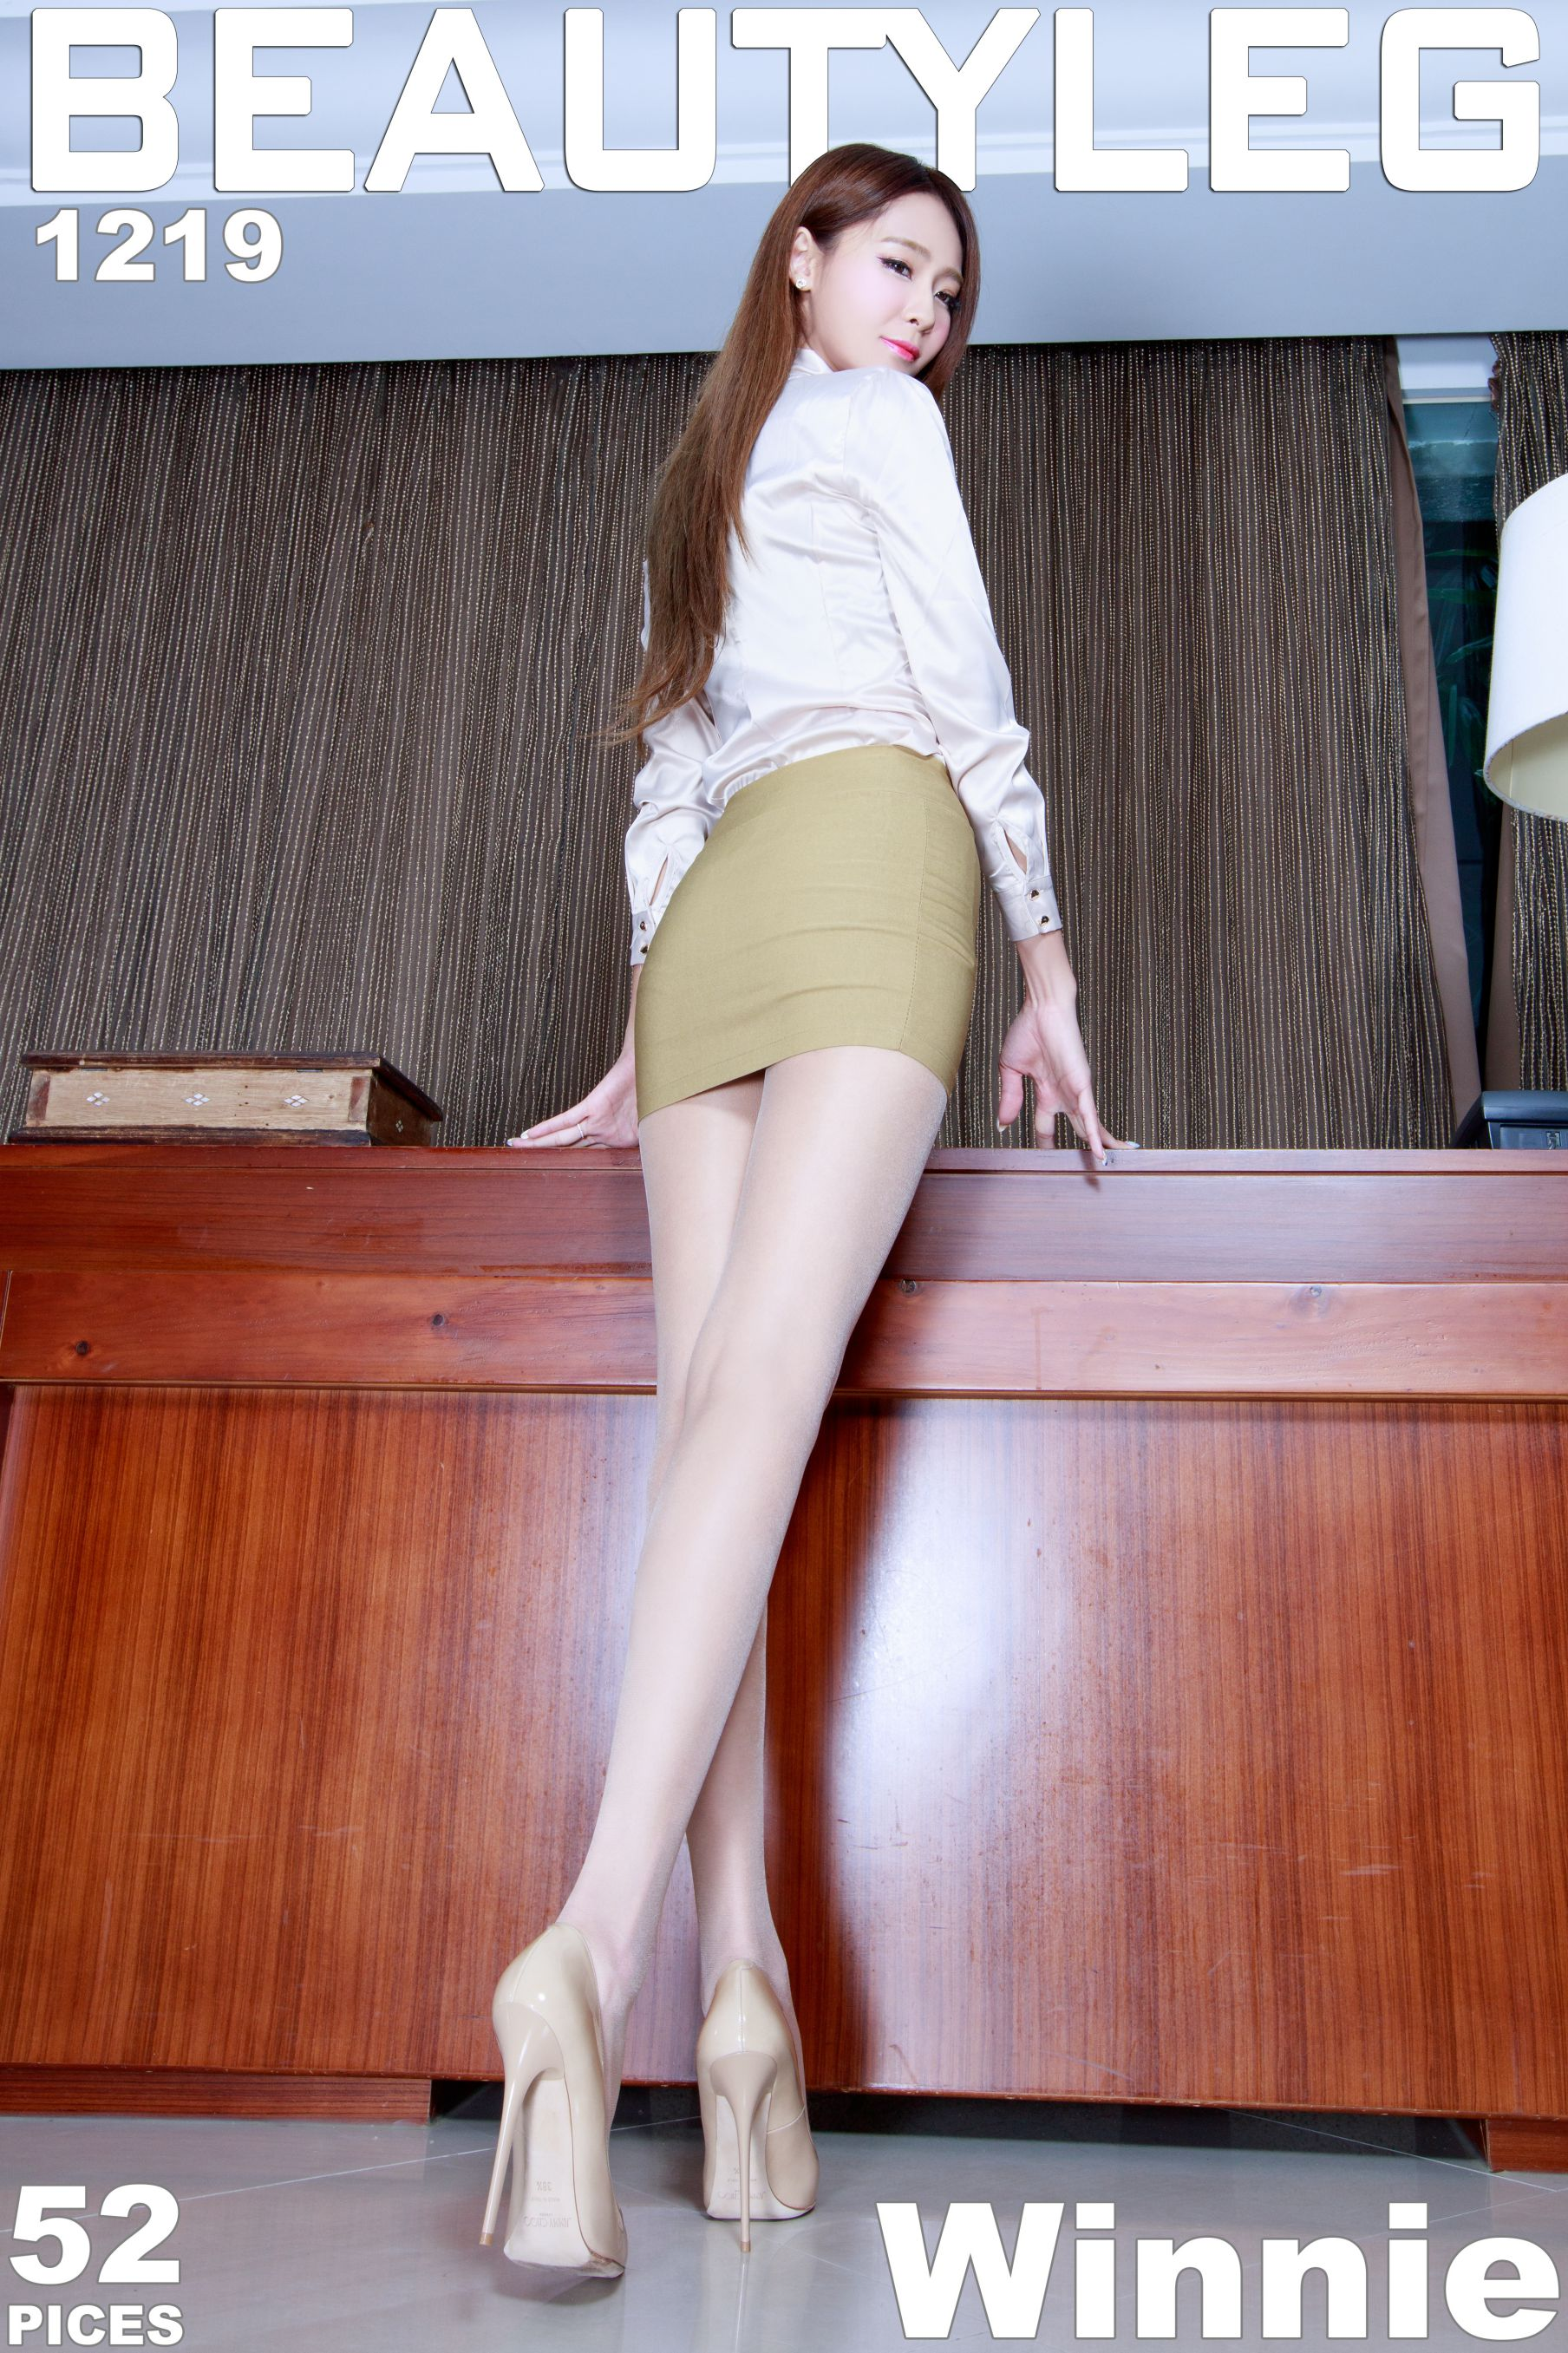 VOL.113 [Beautyleg]高跟美腿:Winnie小雪(庄咏惠,庄温妮,腿模Winnie)高品质写真套图(47P)